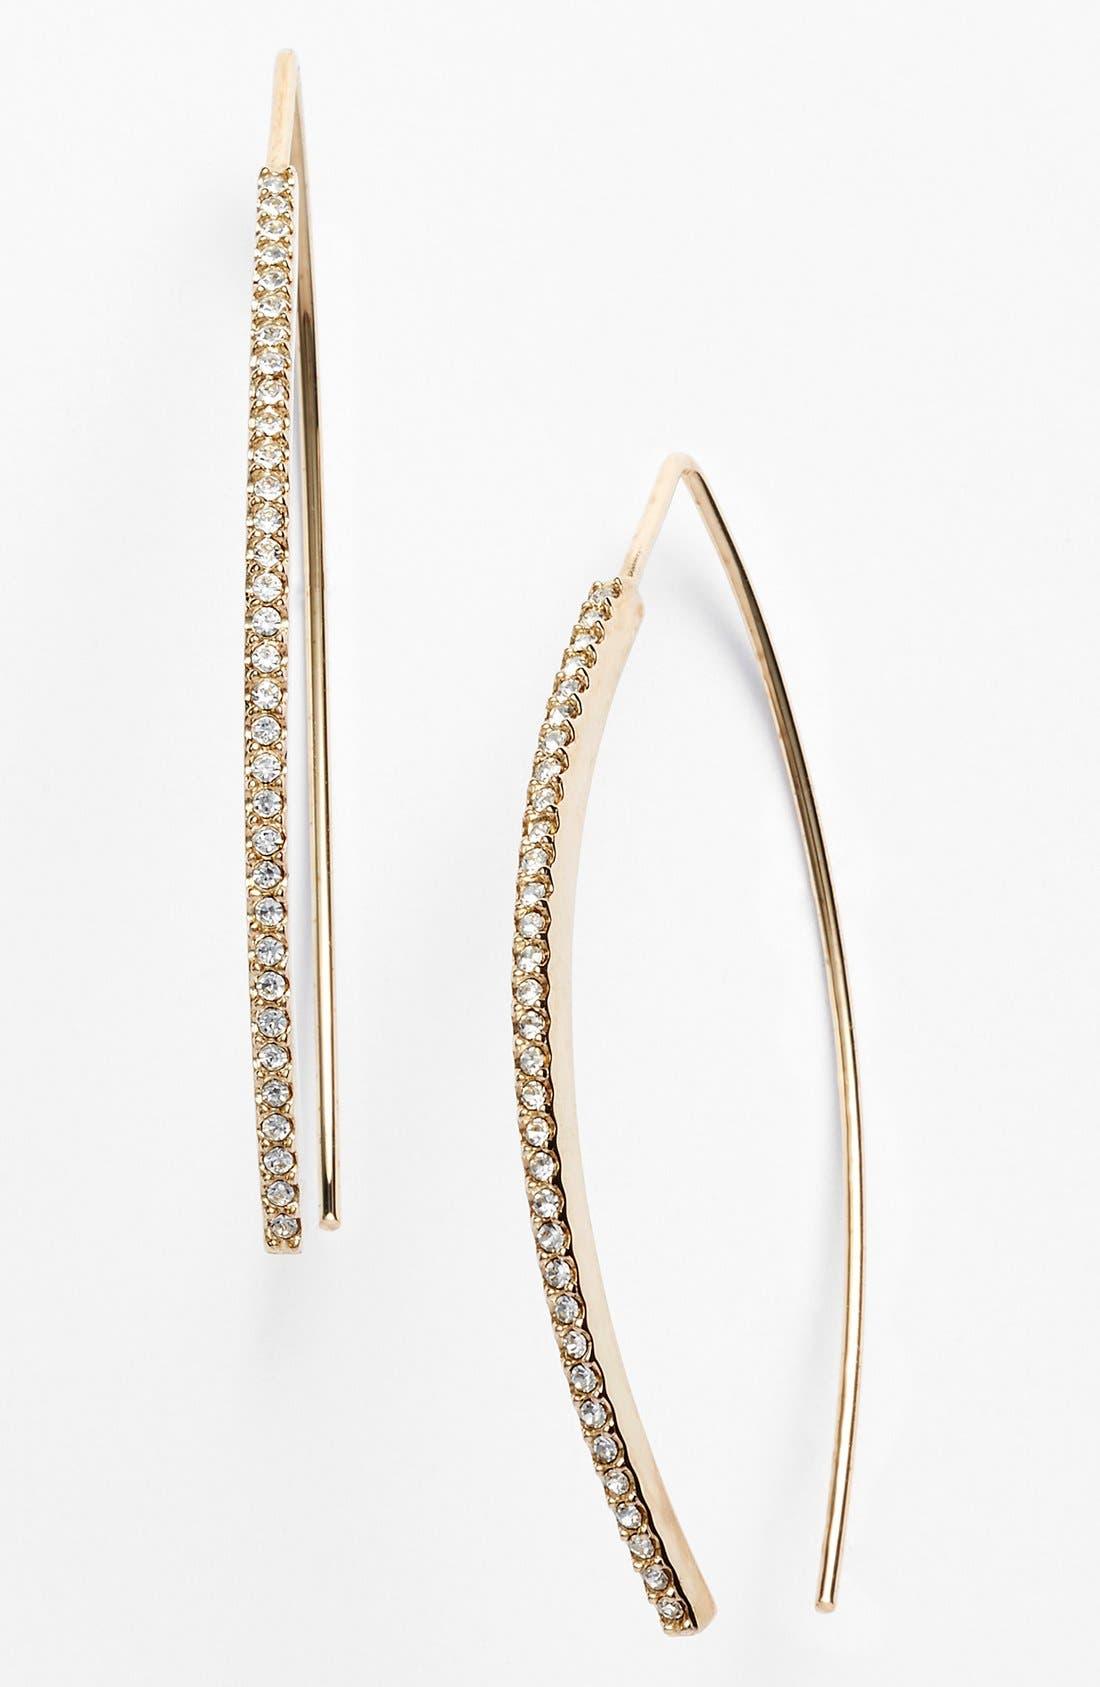 Main Image - Judith Jack Linear Earrings